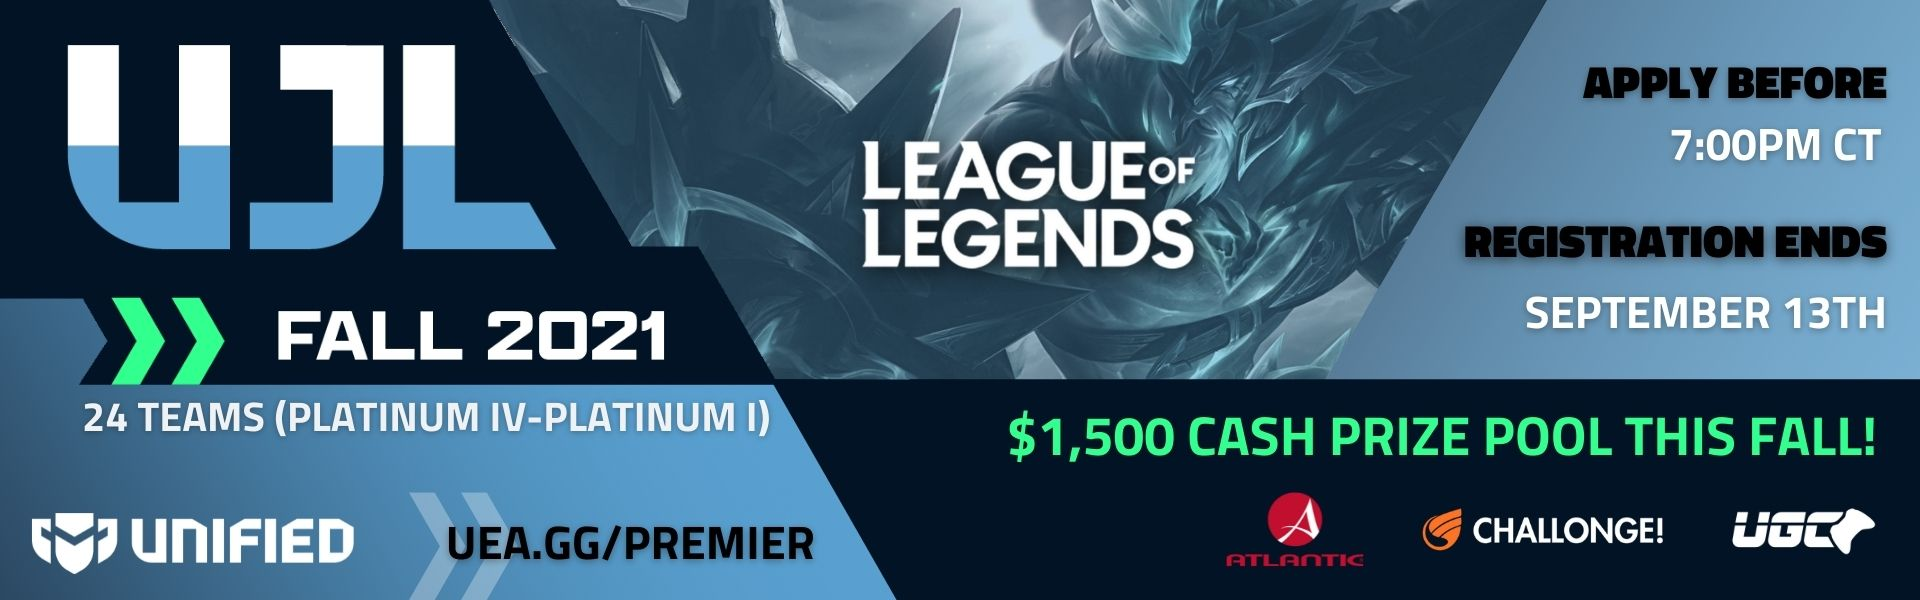 Unified Junior League - League of Legends - Fall 2021